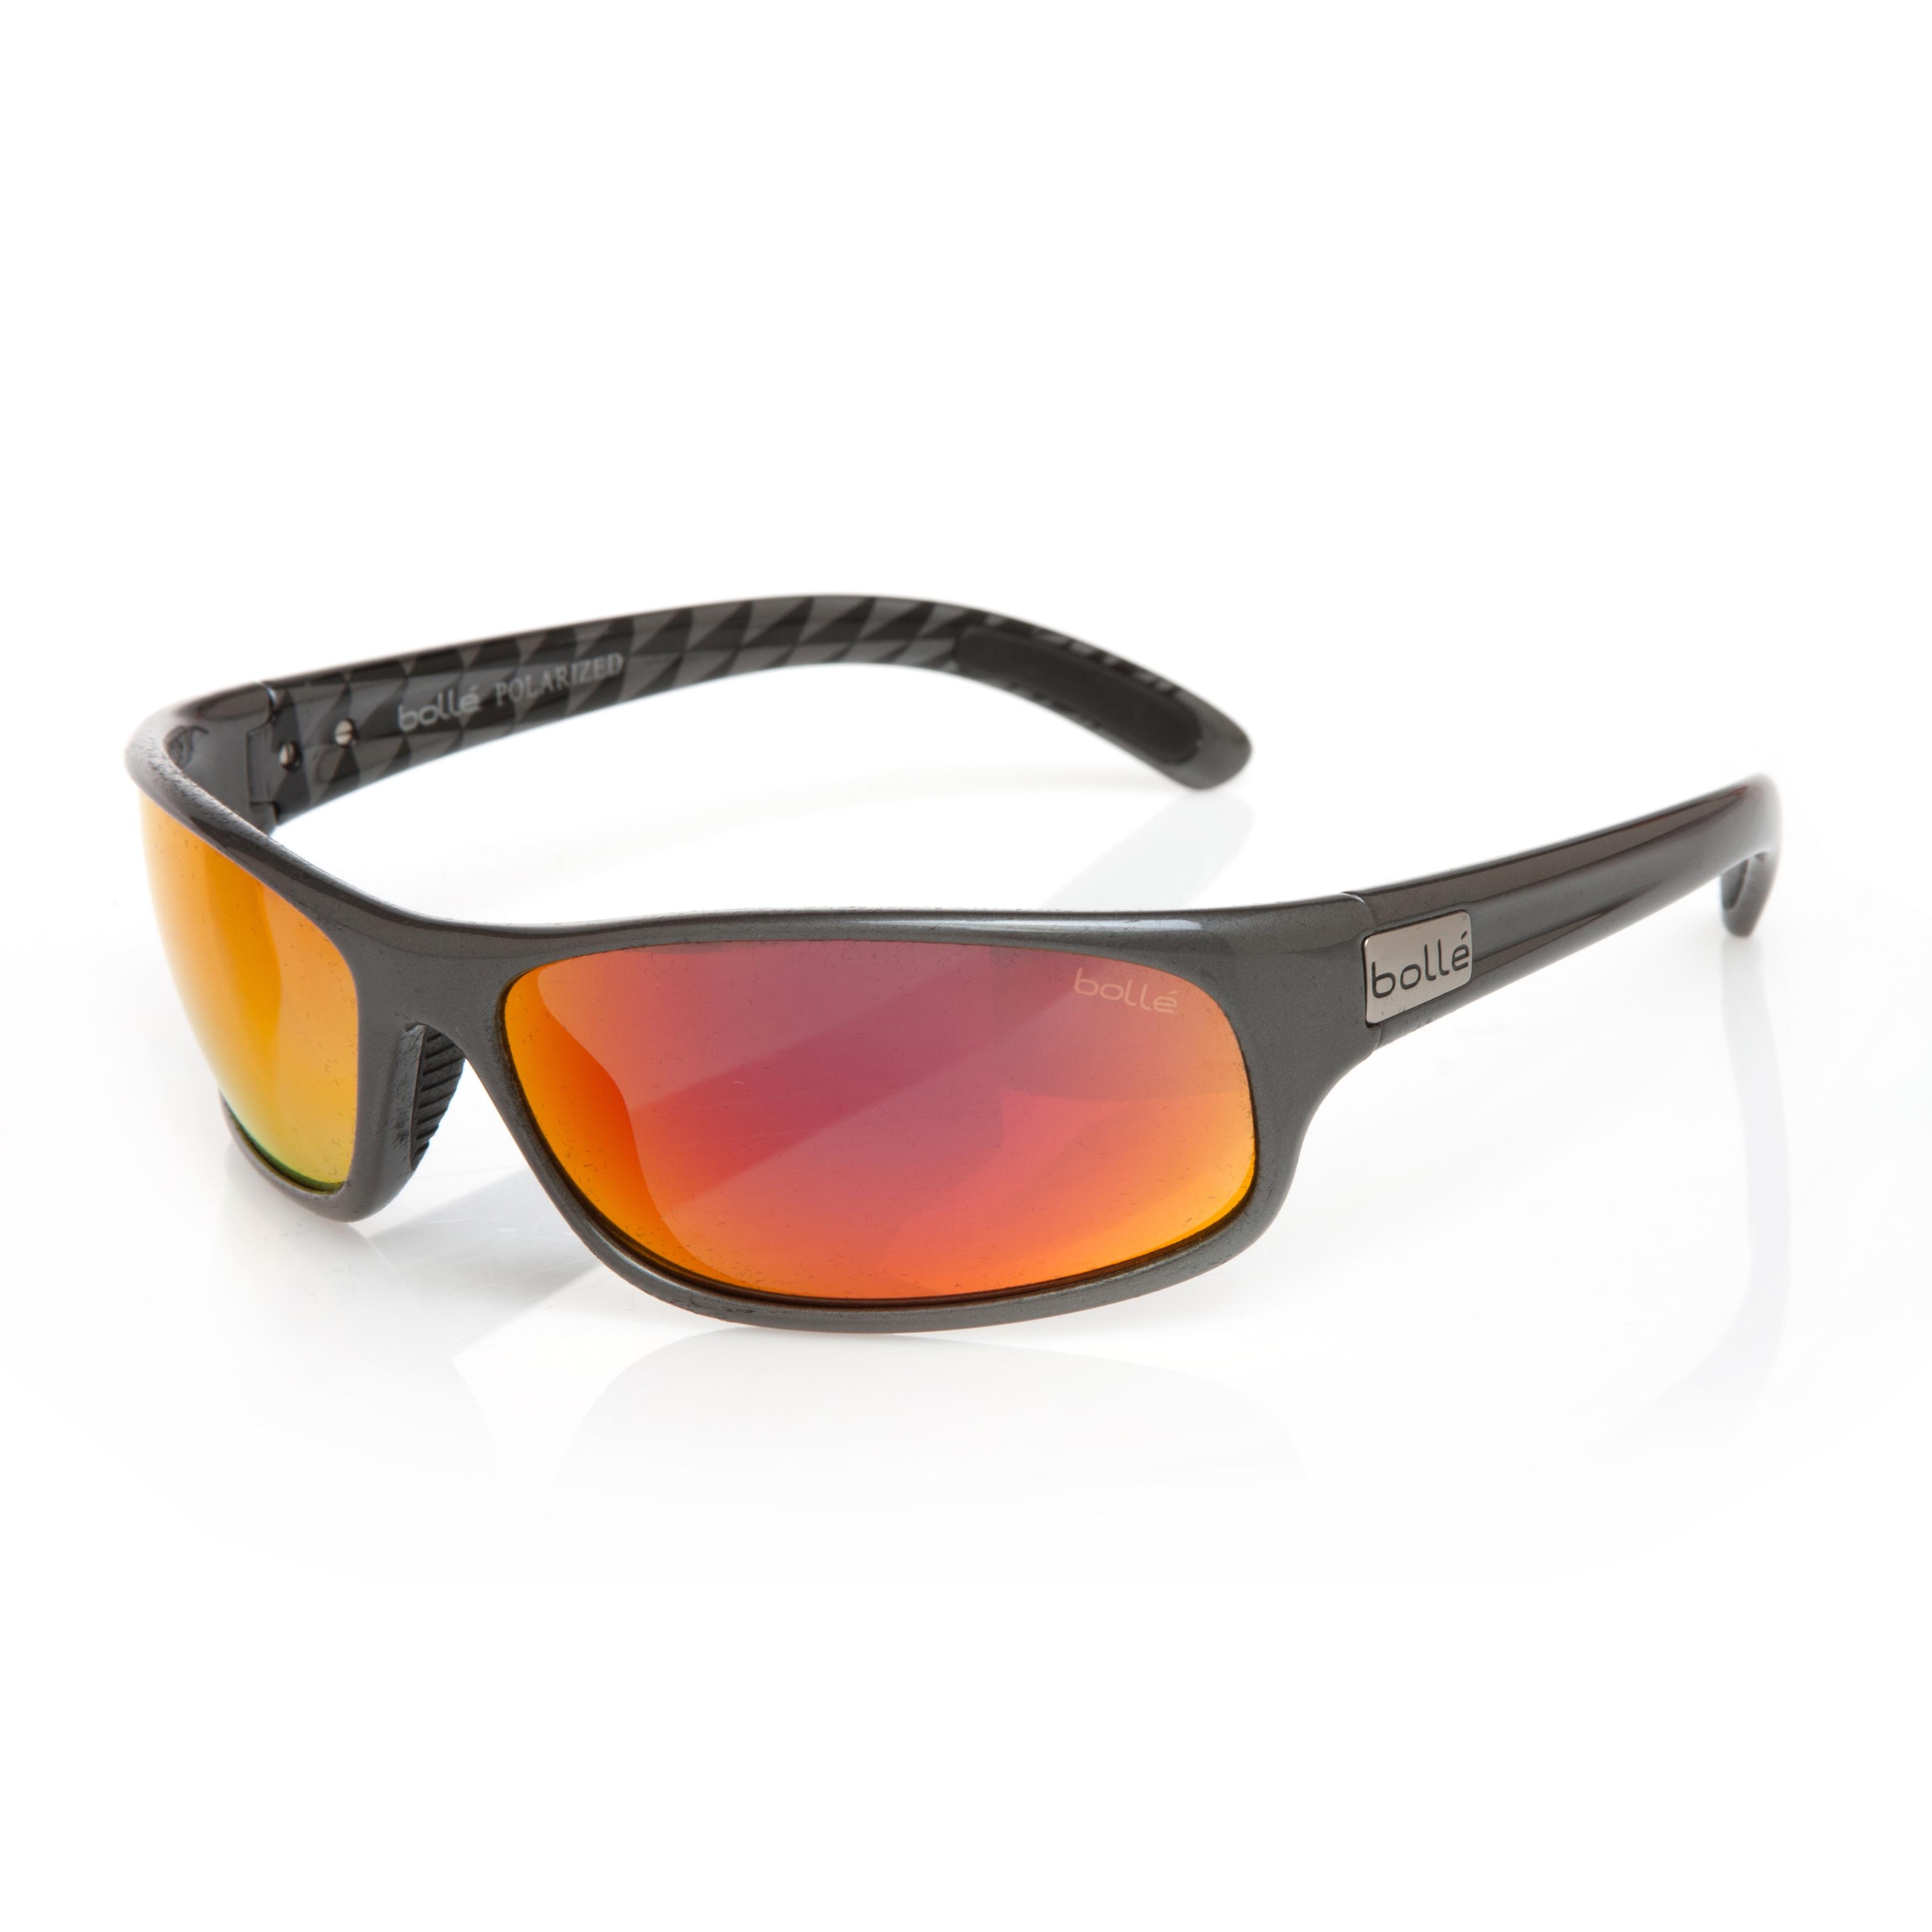 cdc16194f4 Bolle Men s  Anaconda  Shiny Gunmetal Polycarbonate Sport Sunglasses